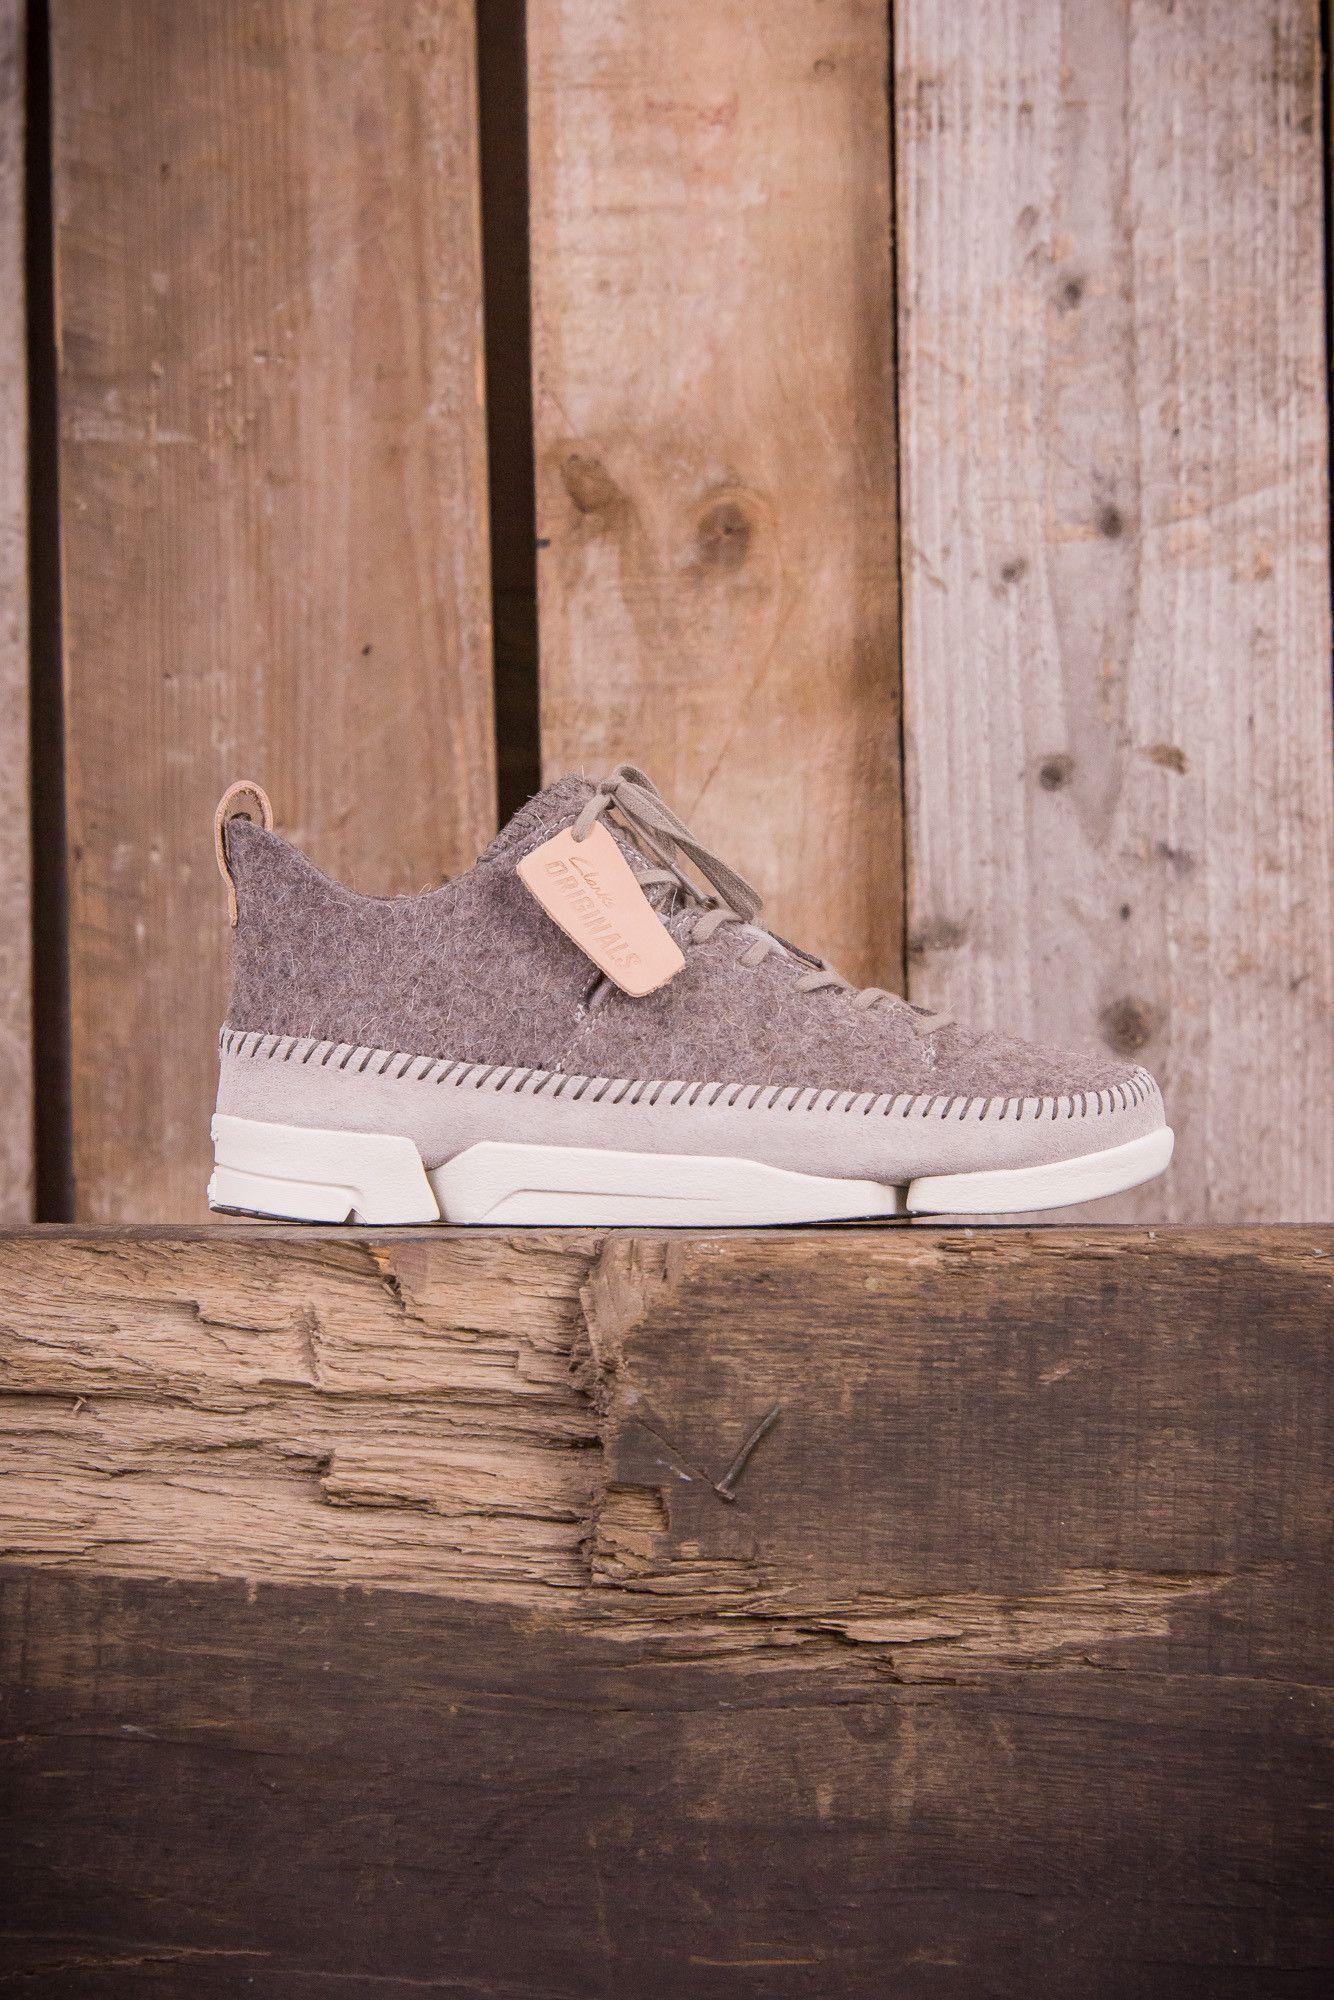 Clarks Originals Trigenics Flex Wool - Grey Felt - Footwear - The Priory - 1